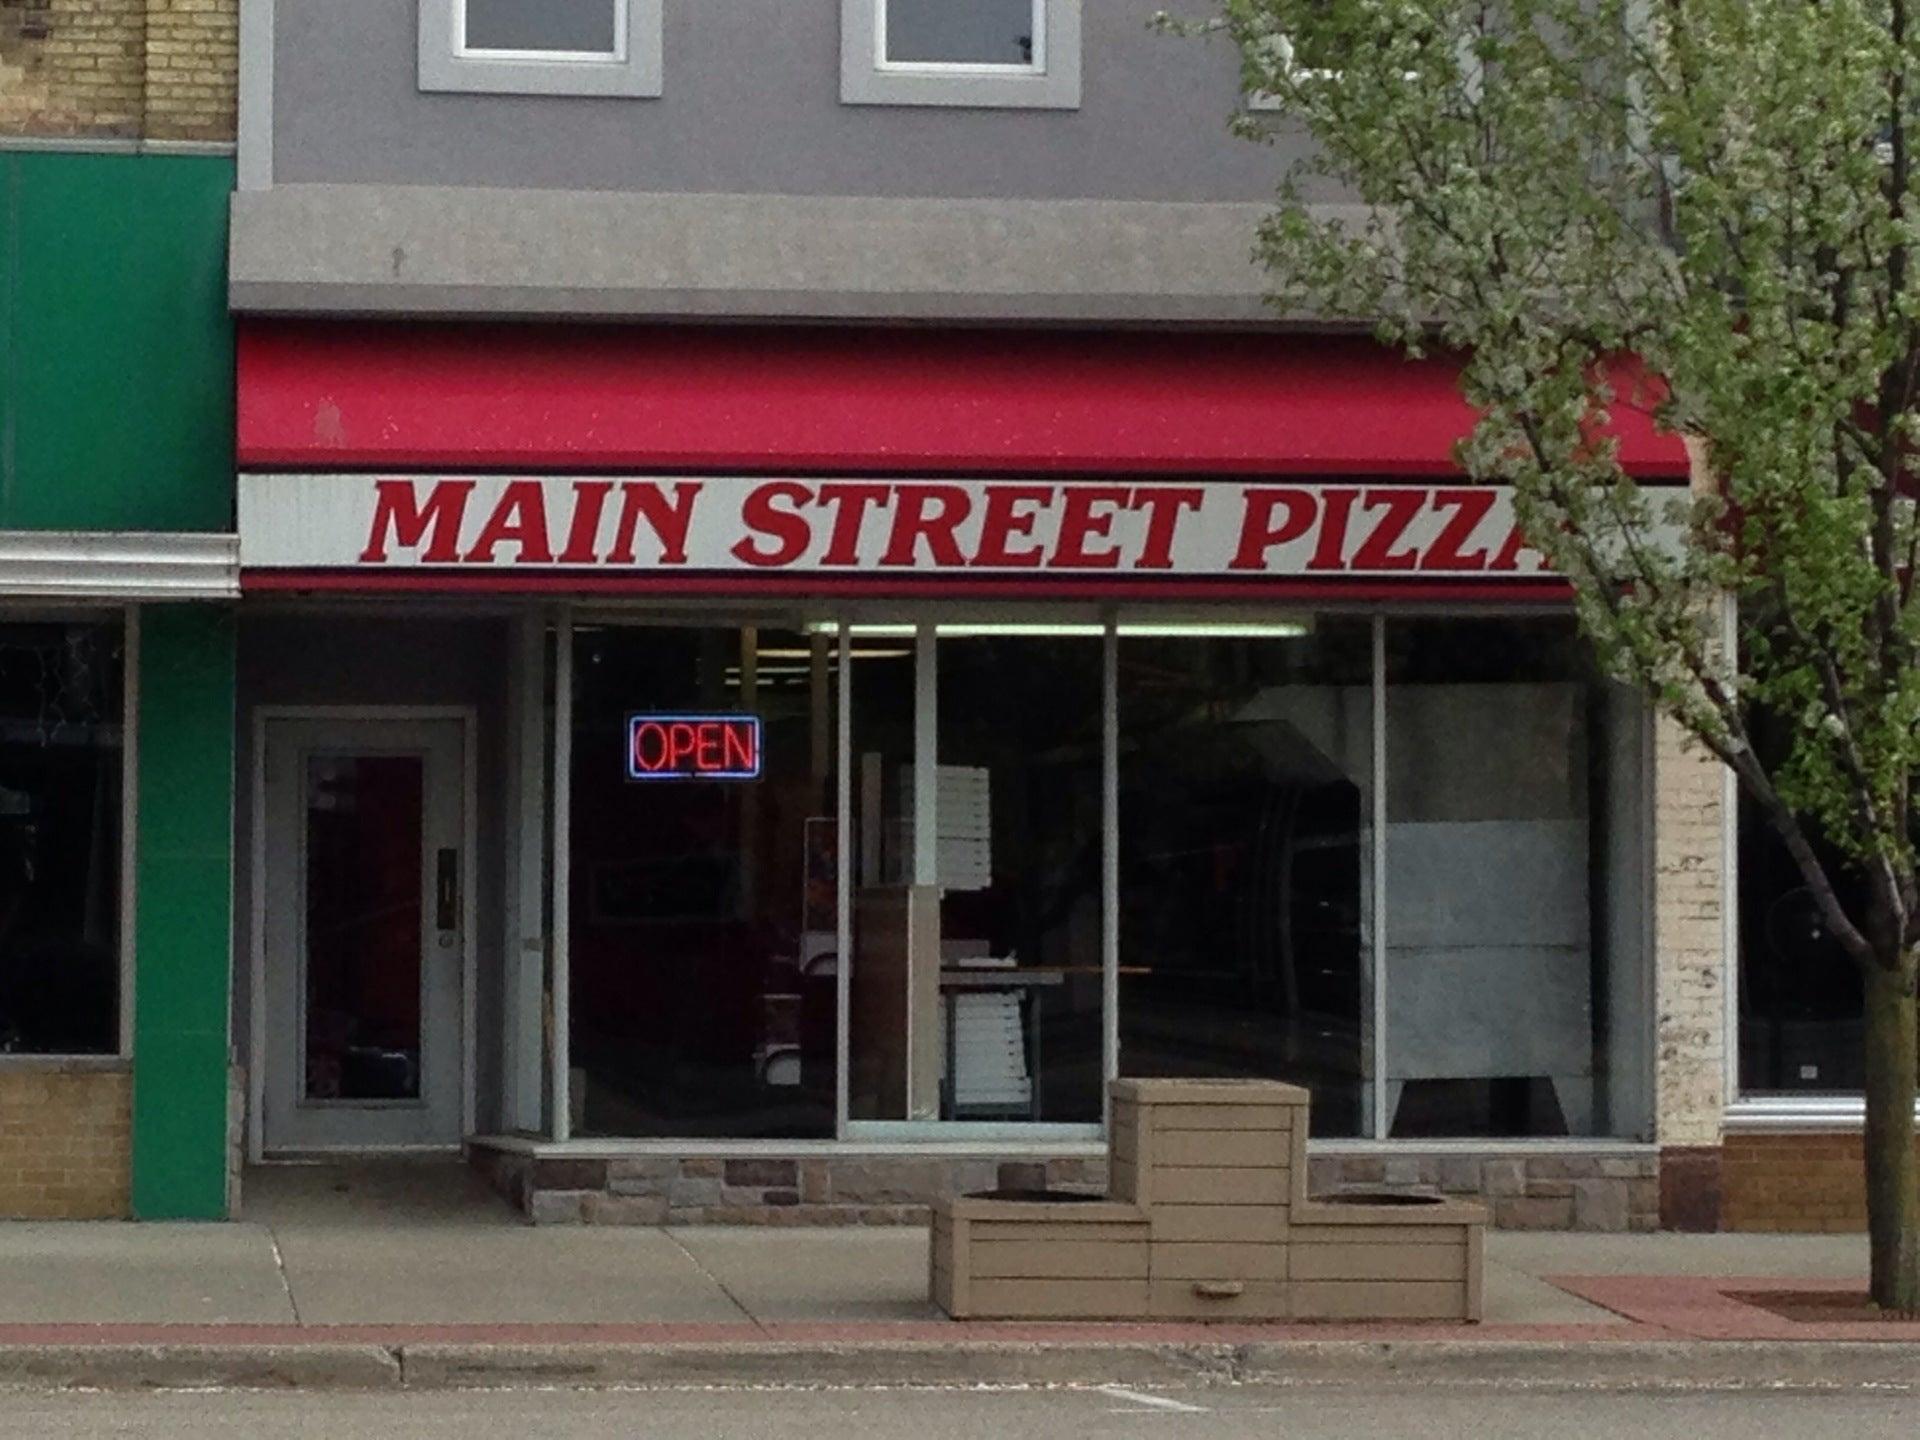 MAIN STREET PIZZA,